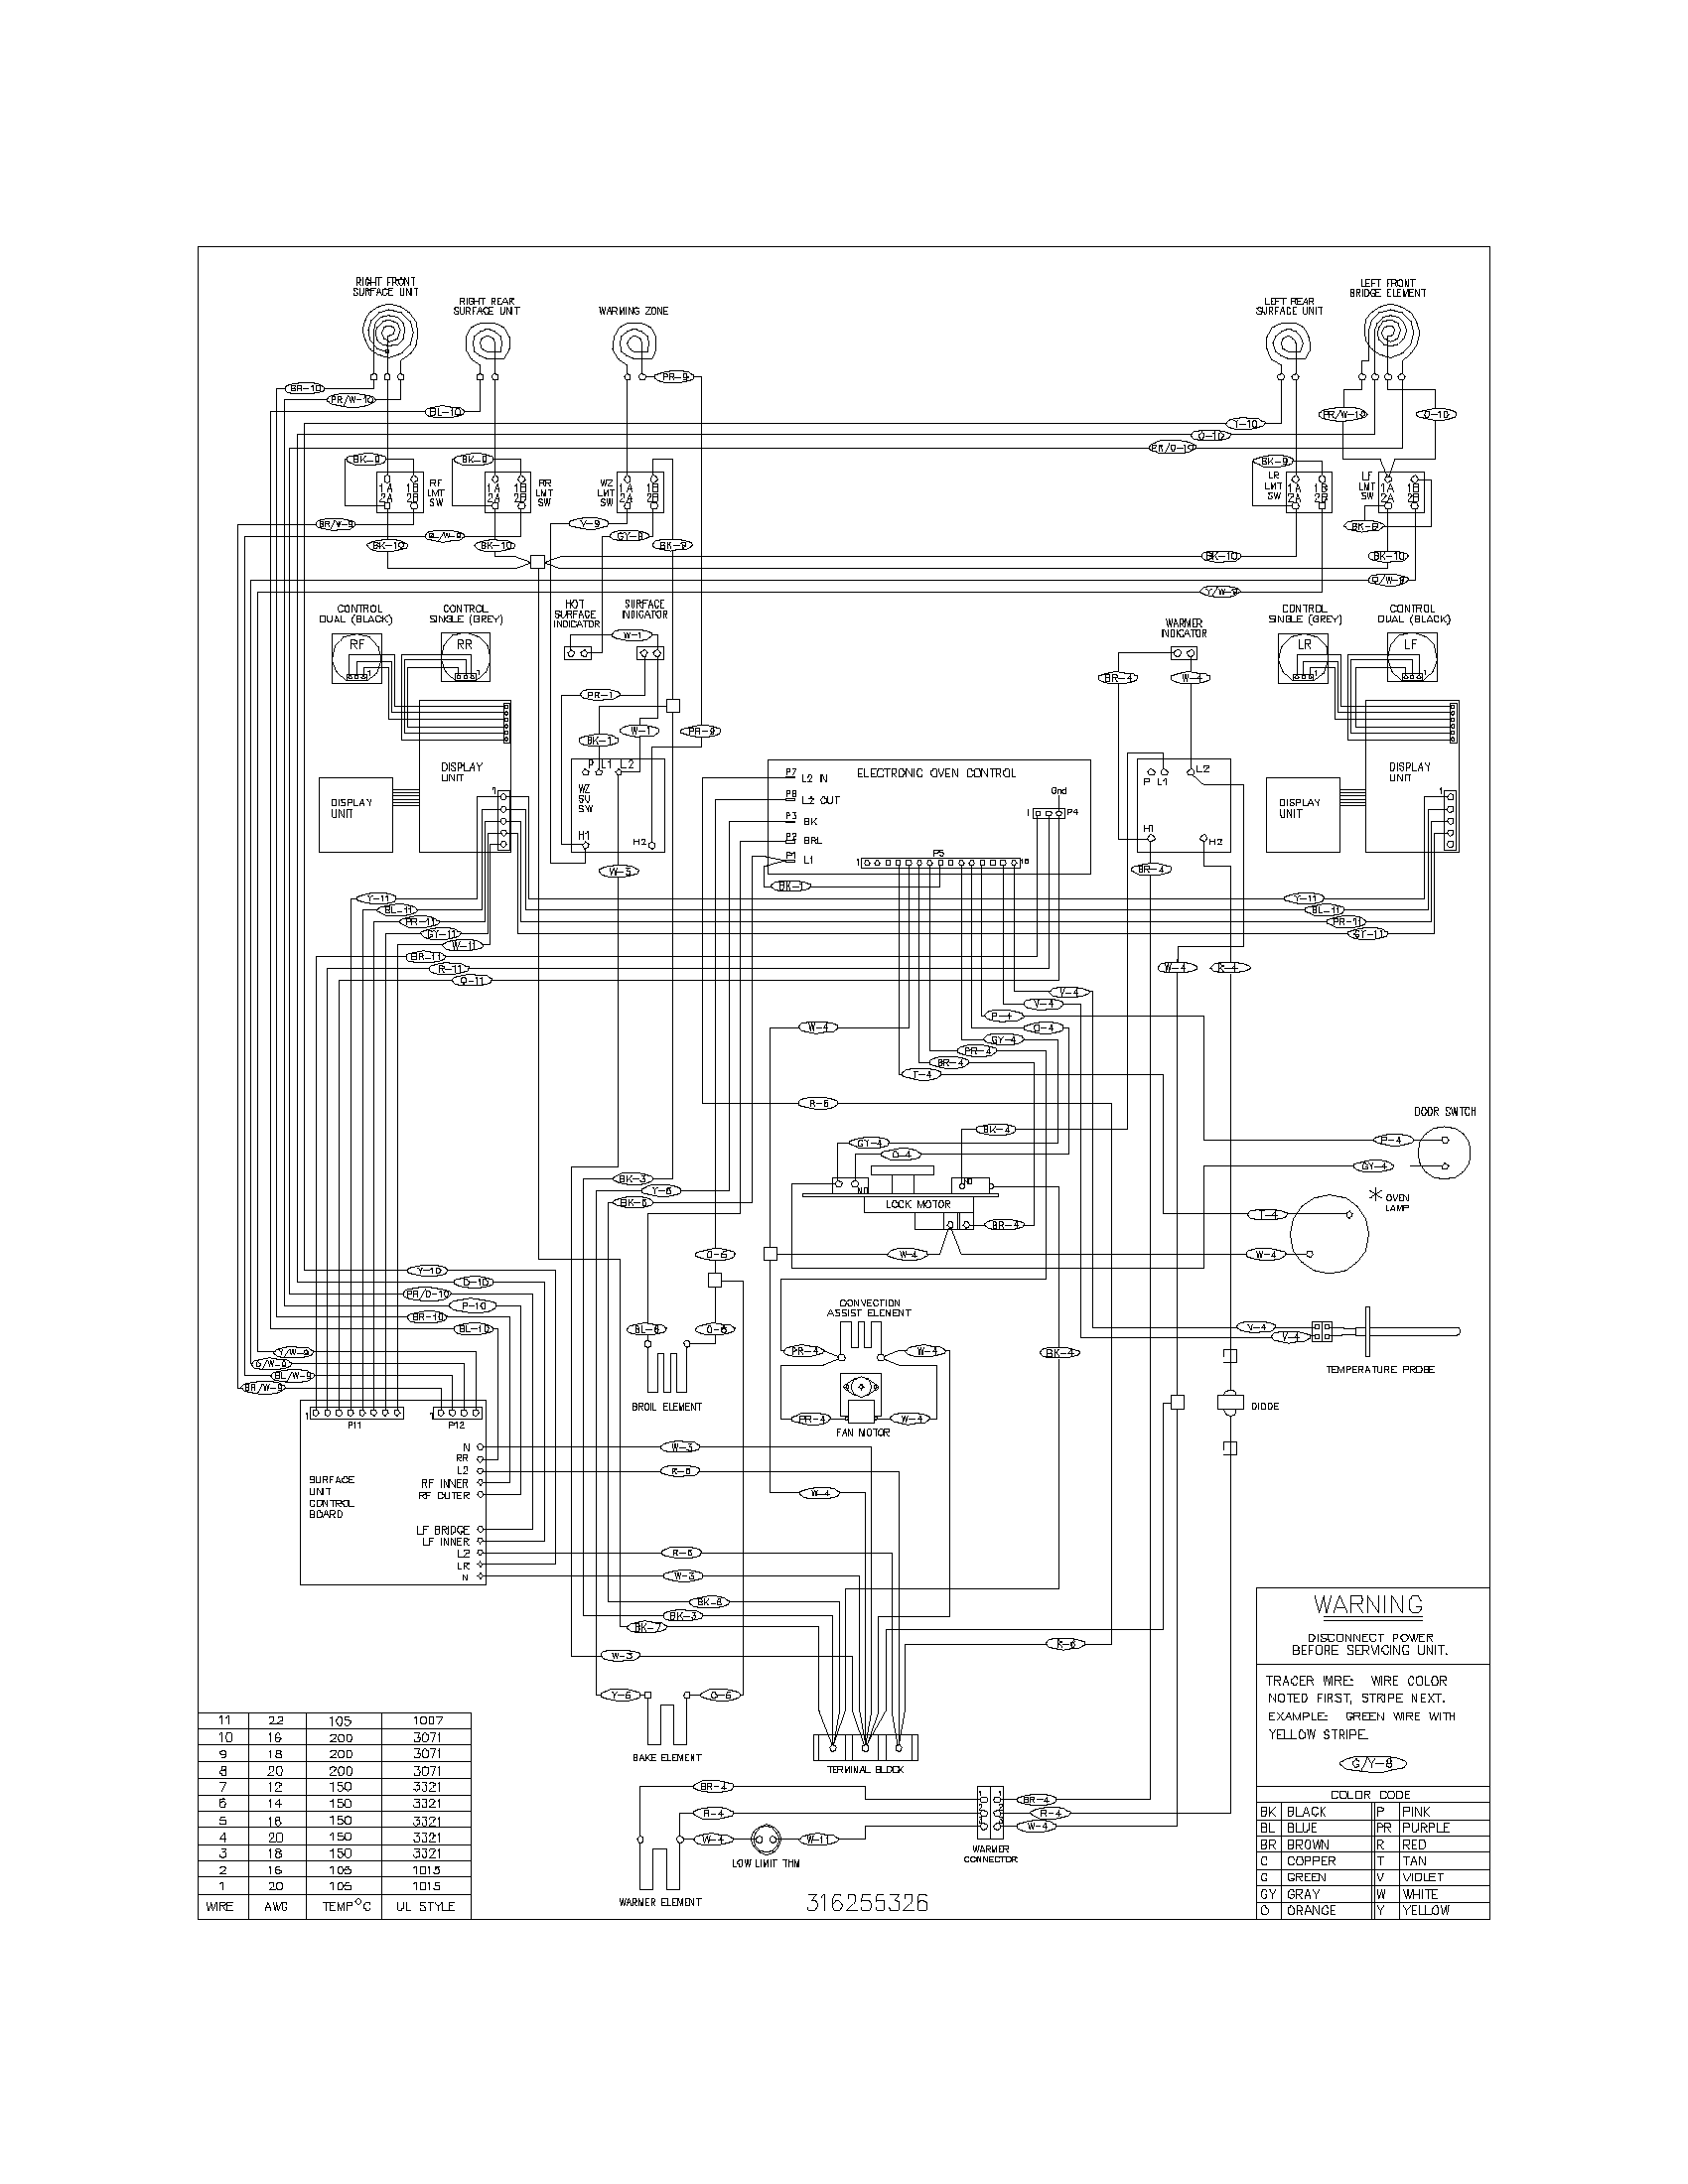 [ANLQ_8698]  OW_6946] Plgf389Ccb Gas Range Wiring Diagram Parts Diagram Schematic Wiring | Imperial Range Wiring Diagram |  | Oxyt Tomy Itive Kumb Sequ Phae Mohammedshrine Librar Wiring 101